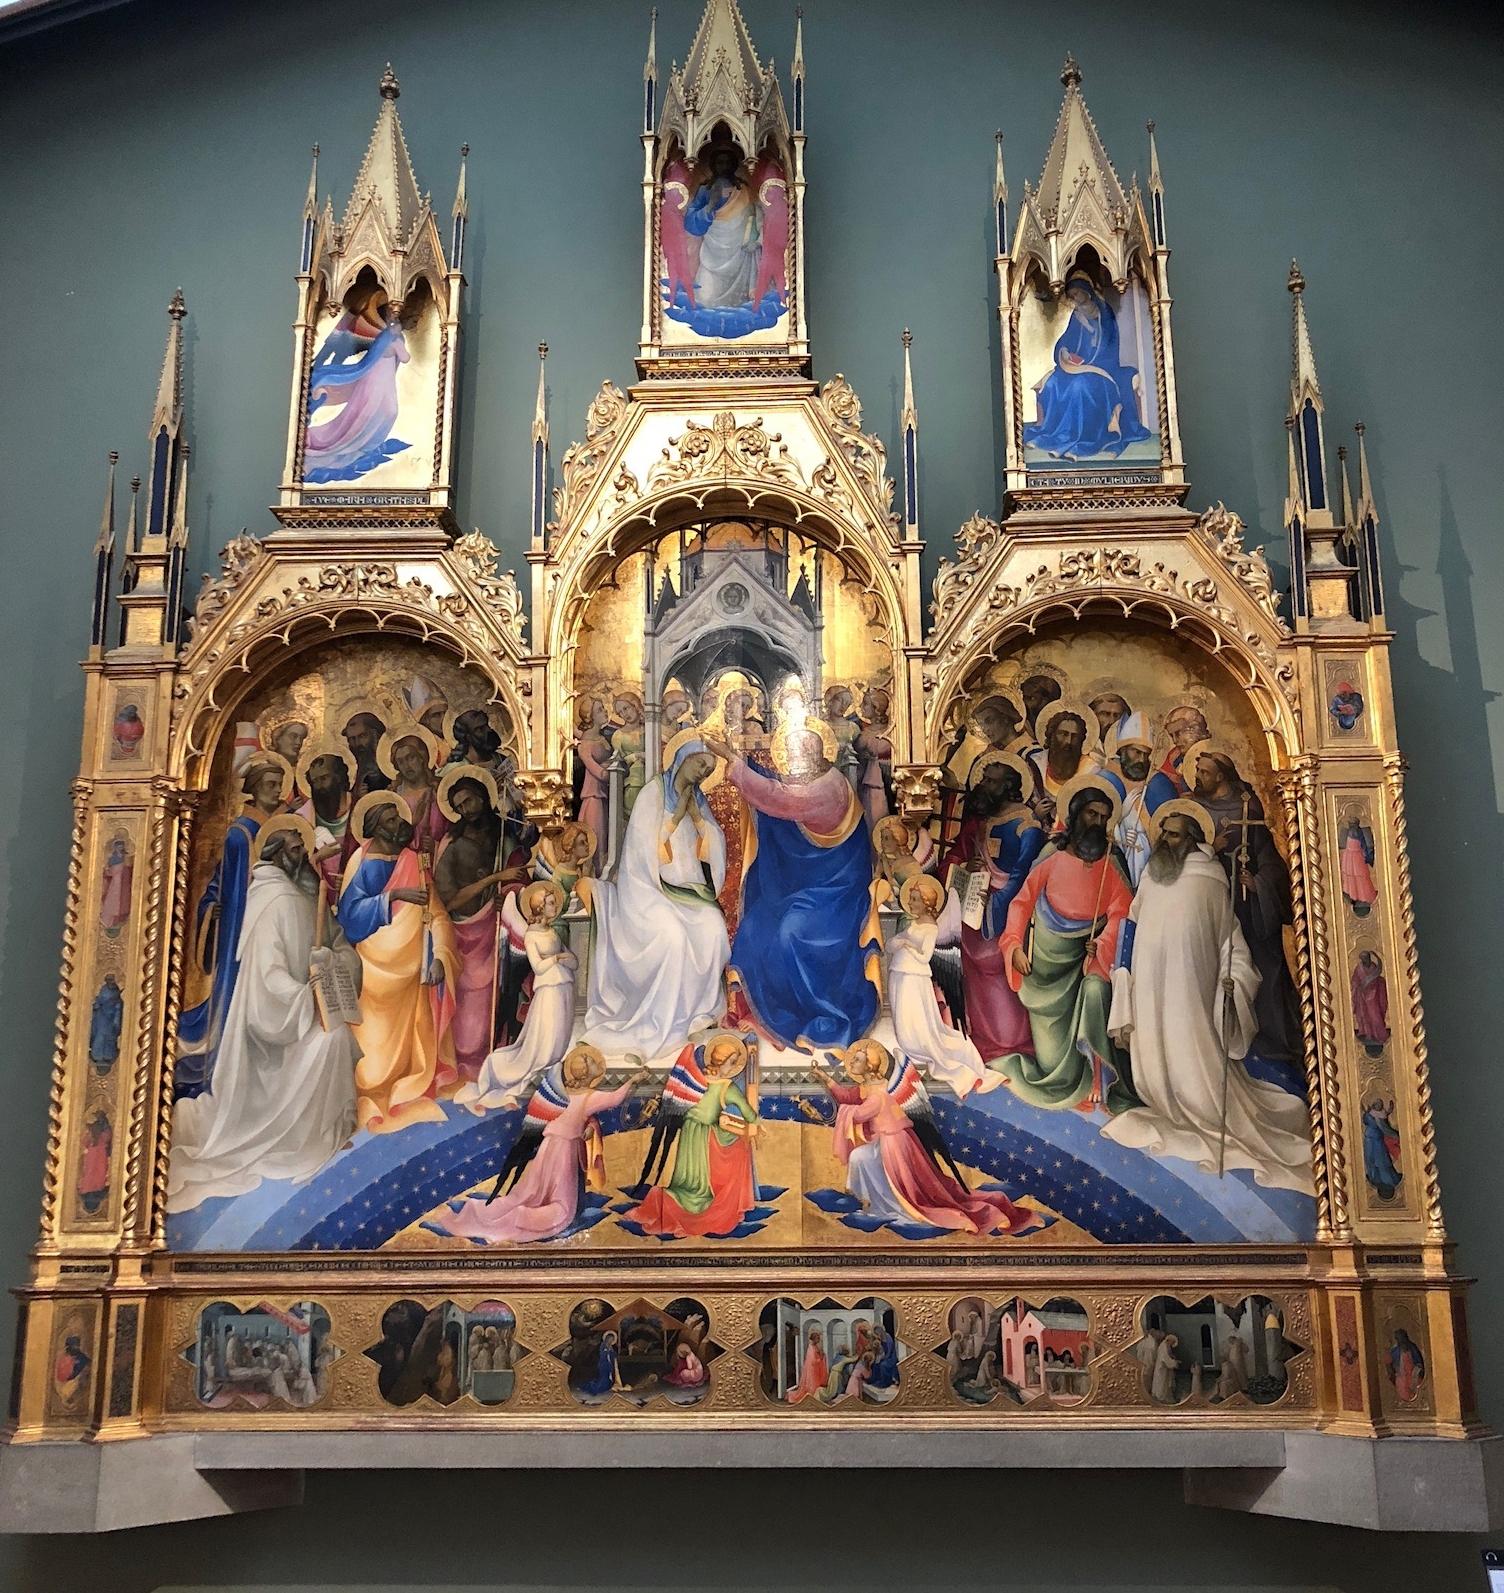 Coronation of the Virgin, circa 1414, tempera on wood by Lorenzo Monaco at the Uffizi Museum.